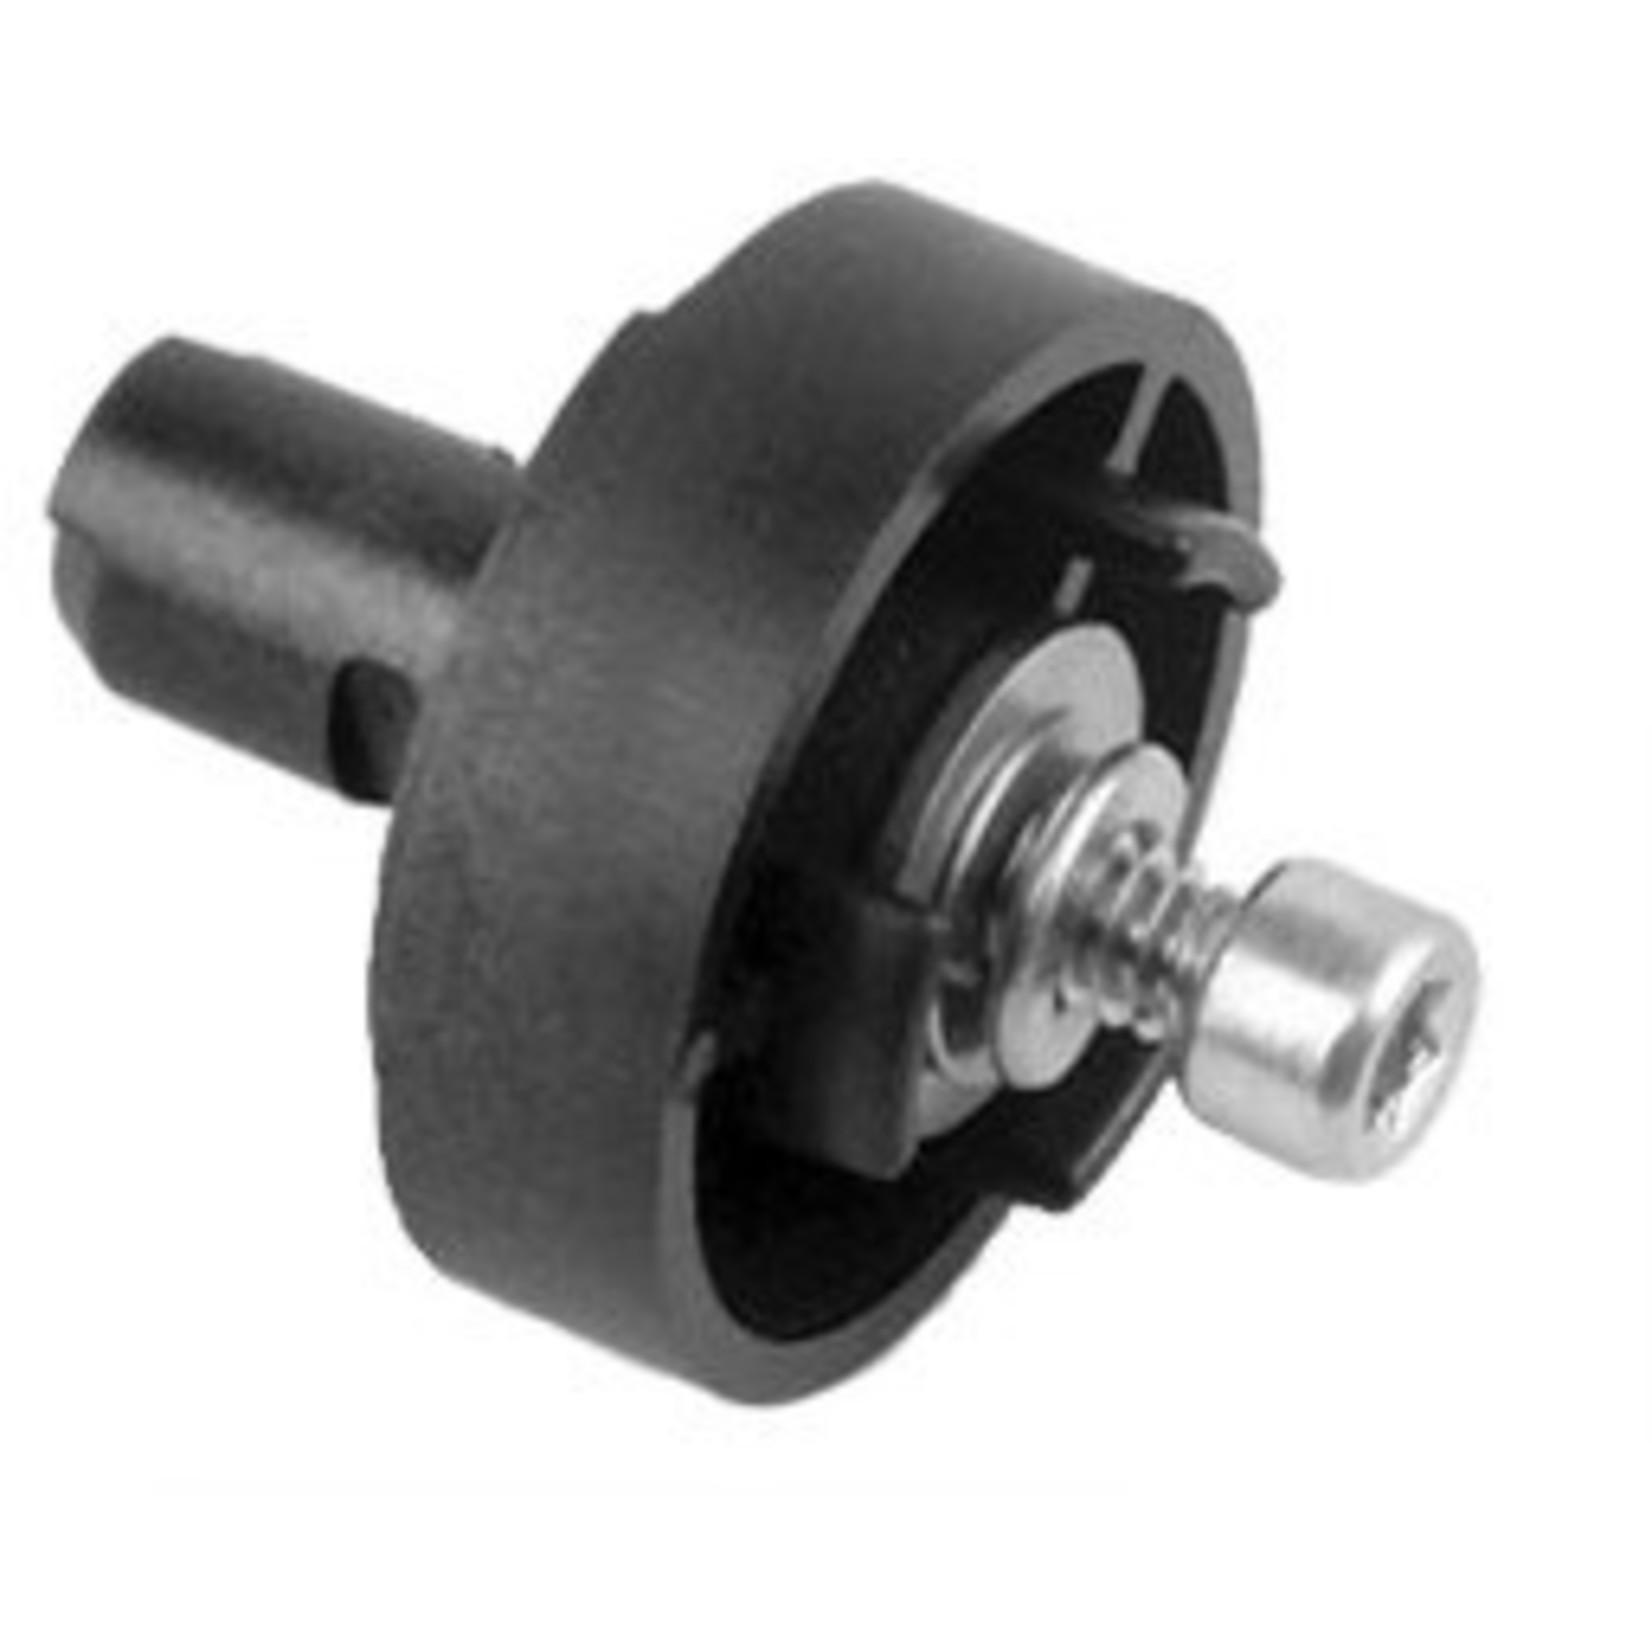 Sealife Flex - Connect Arm Connector Conversionkit for SL961/SL980